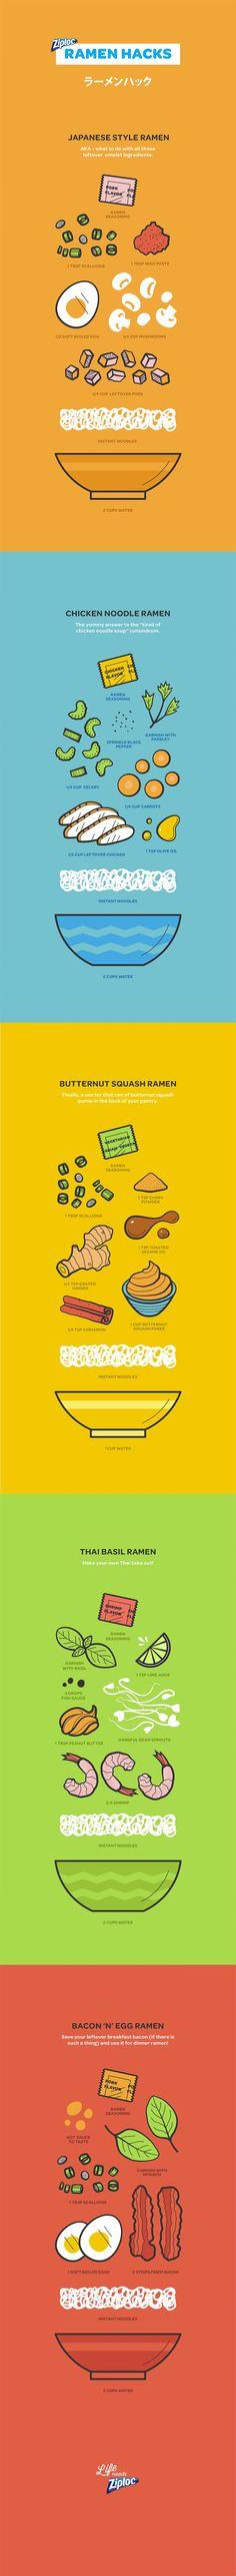 50 Food & Recipe Infographics For Food Lovers - Hongkiat